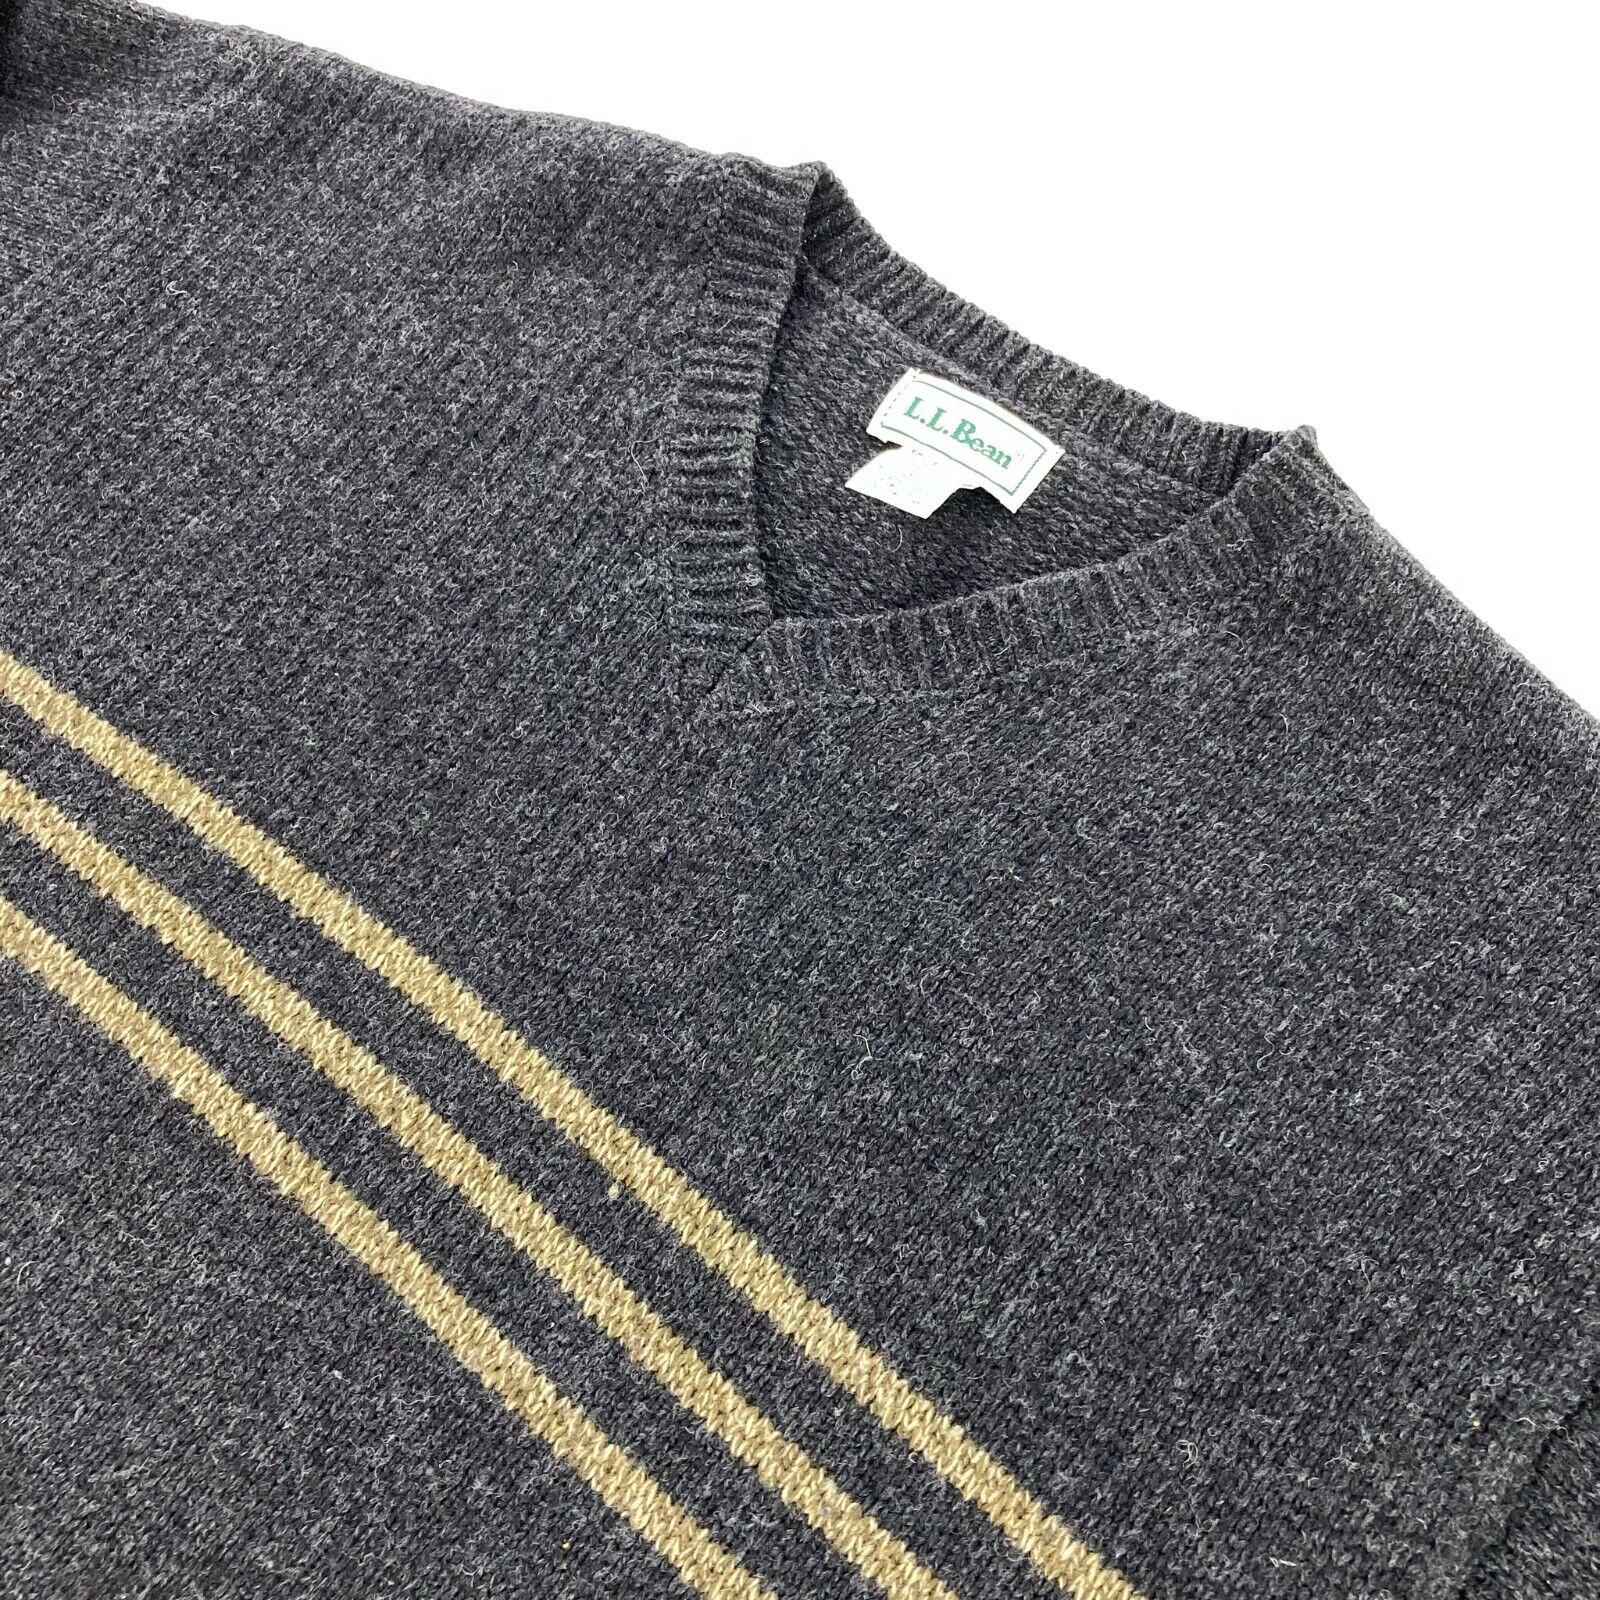 LL Bean Men's Wool V-Neck Sweater Gray • Large - image 1